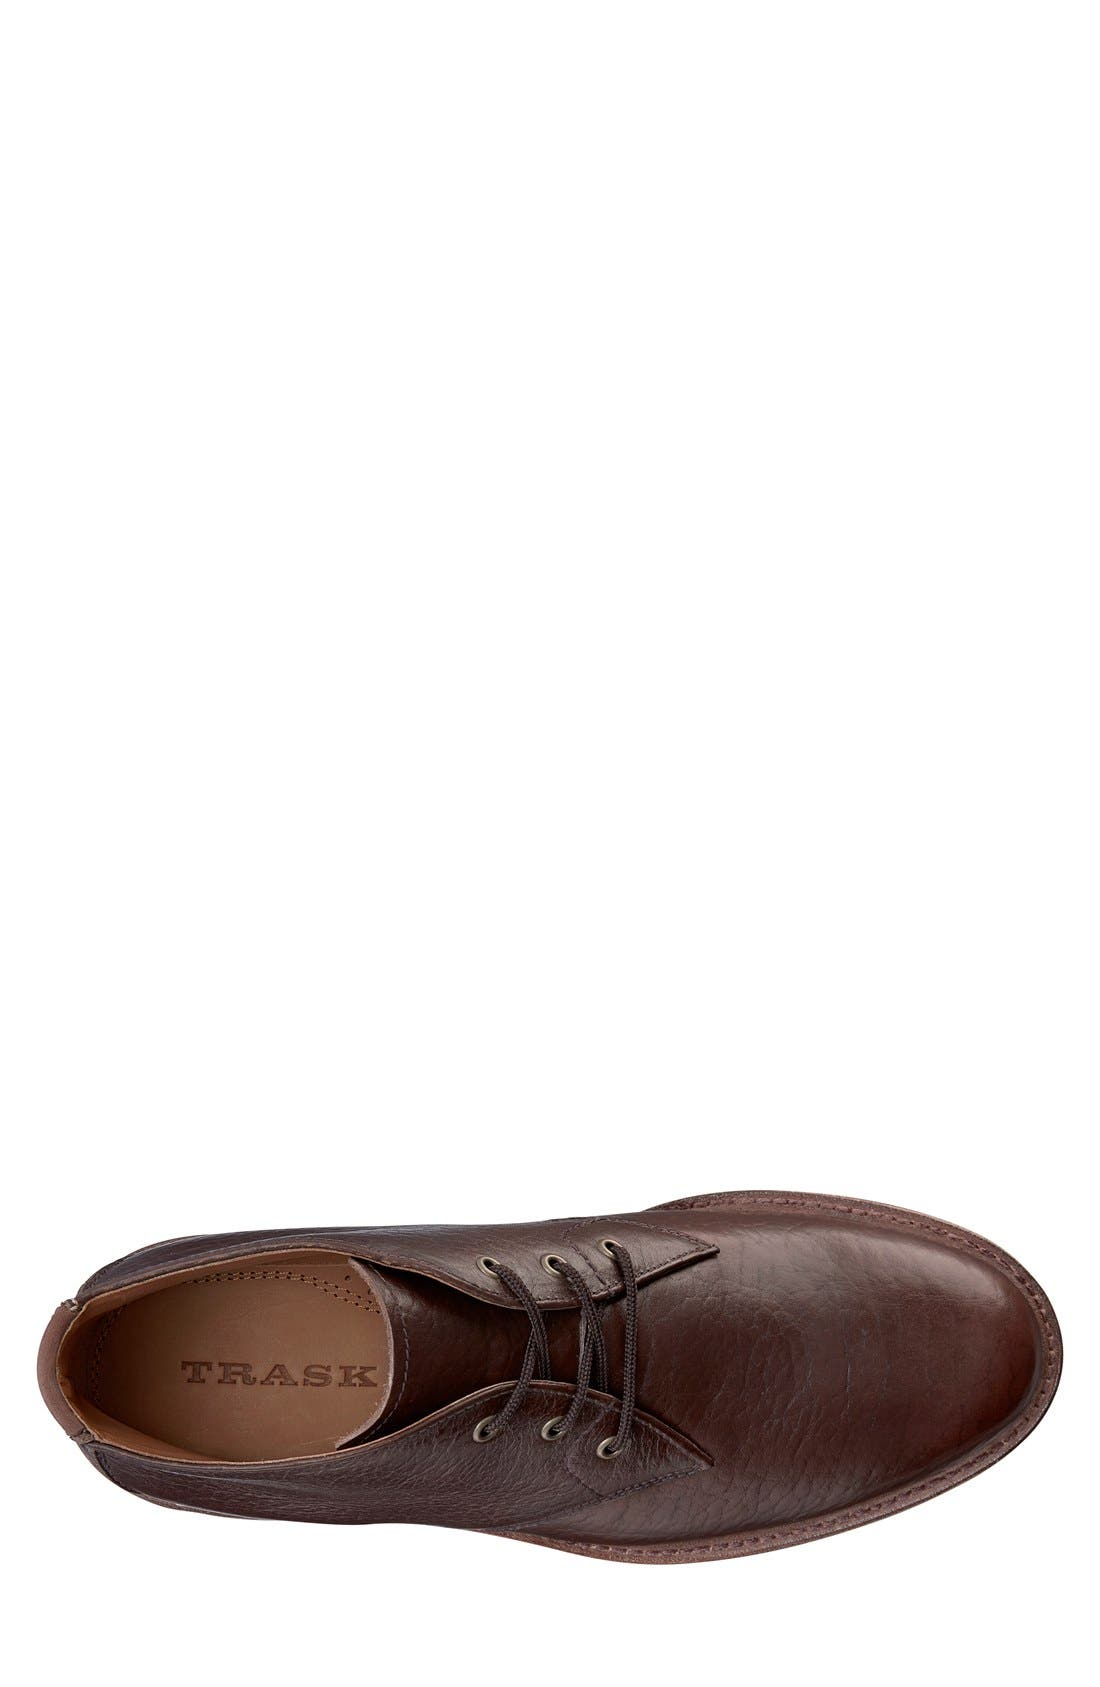 'Gulch II' Chukka Boot,                             Alternate thumbnail 3, color,                             Bourbon Leather